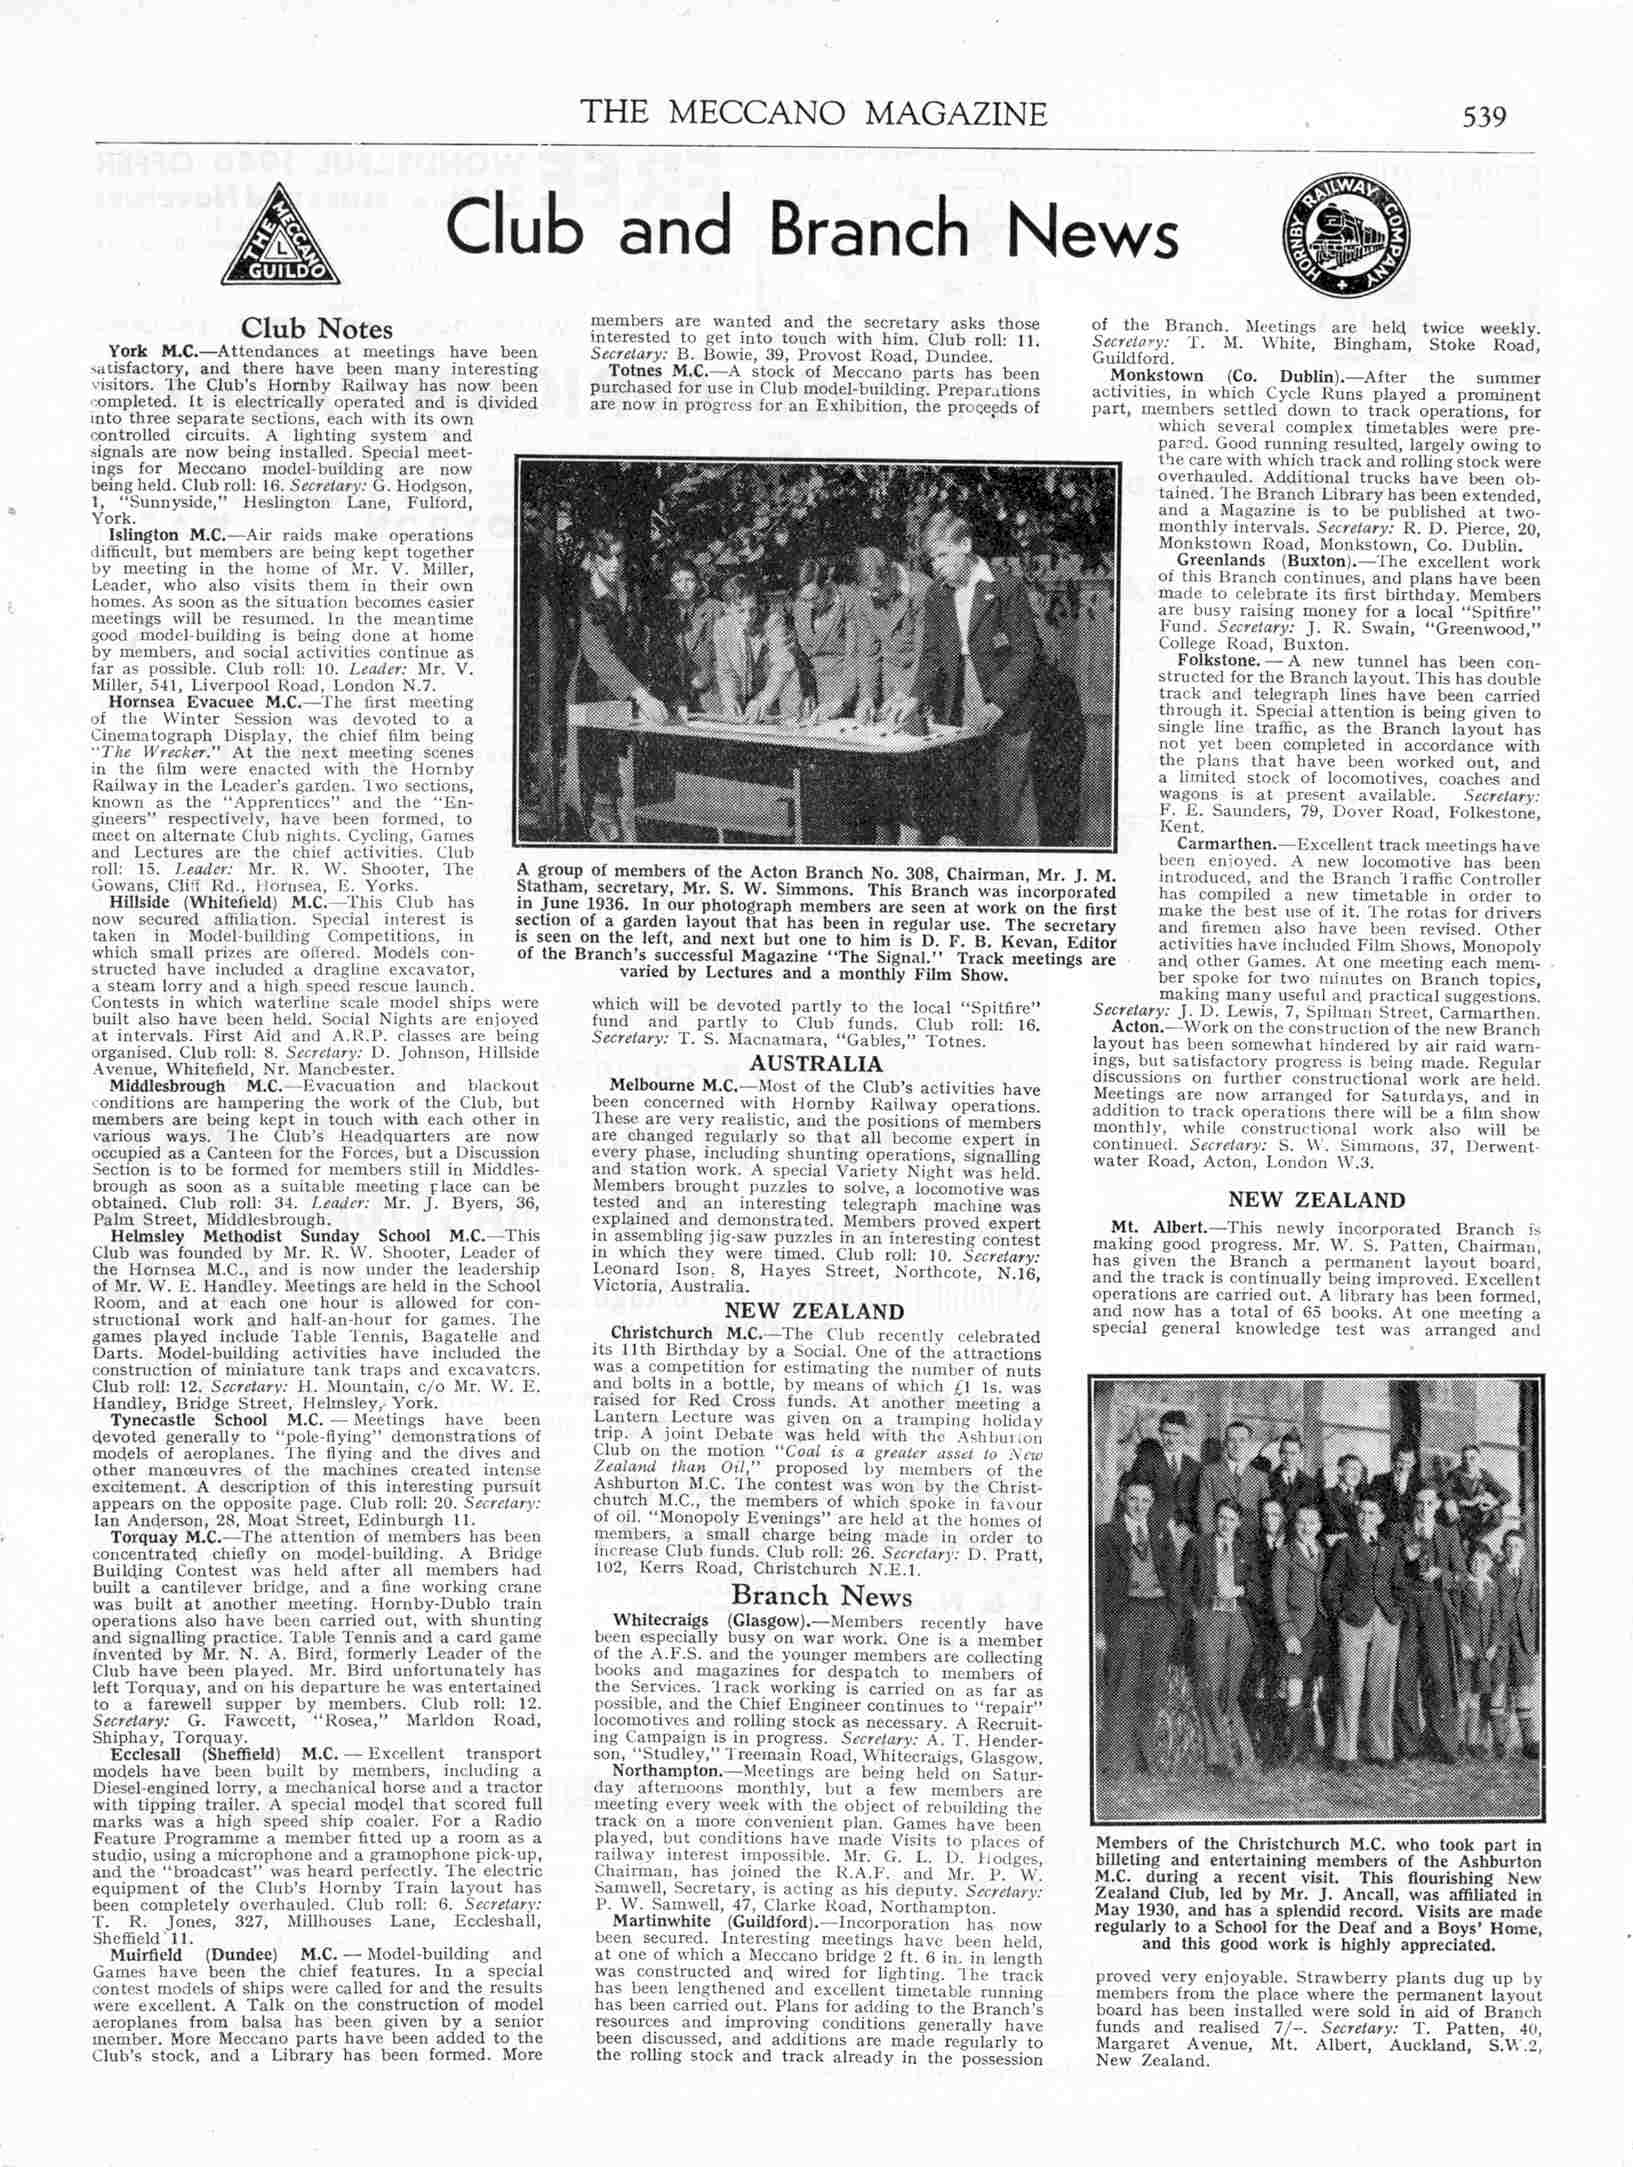 UK Meccano Magazine December 1940 Page 539